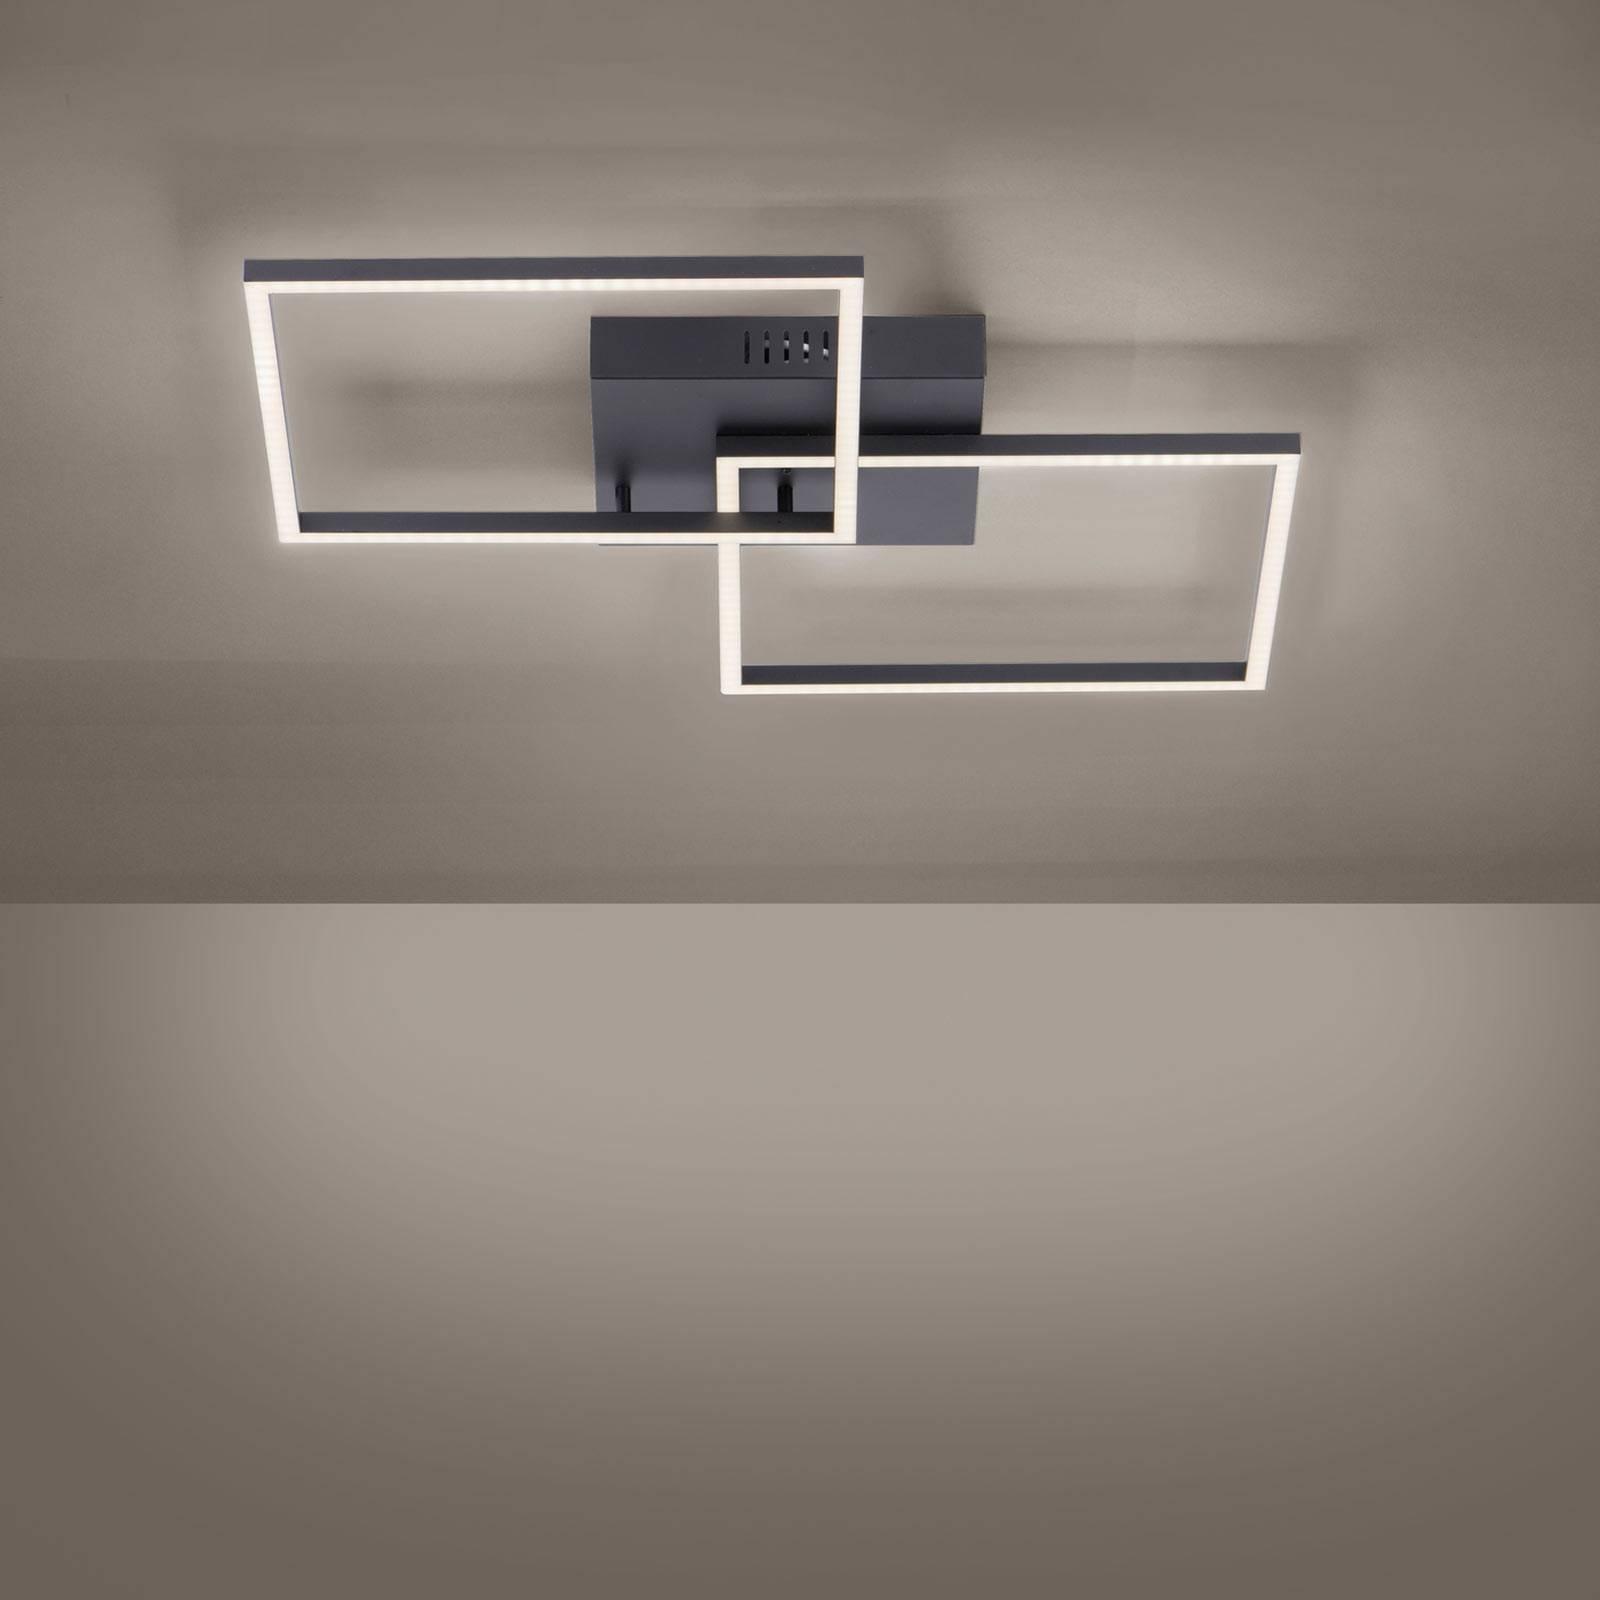 LED plafondlamp Iven, zwart 2-lamps vierkant